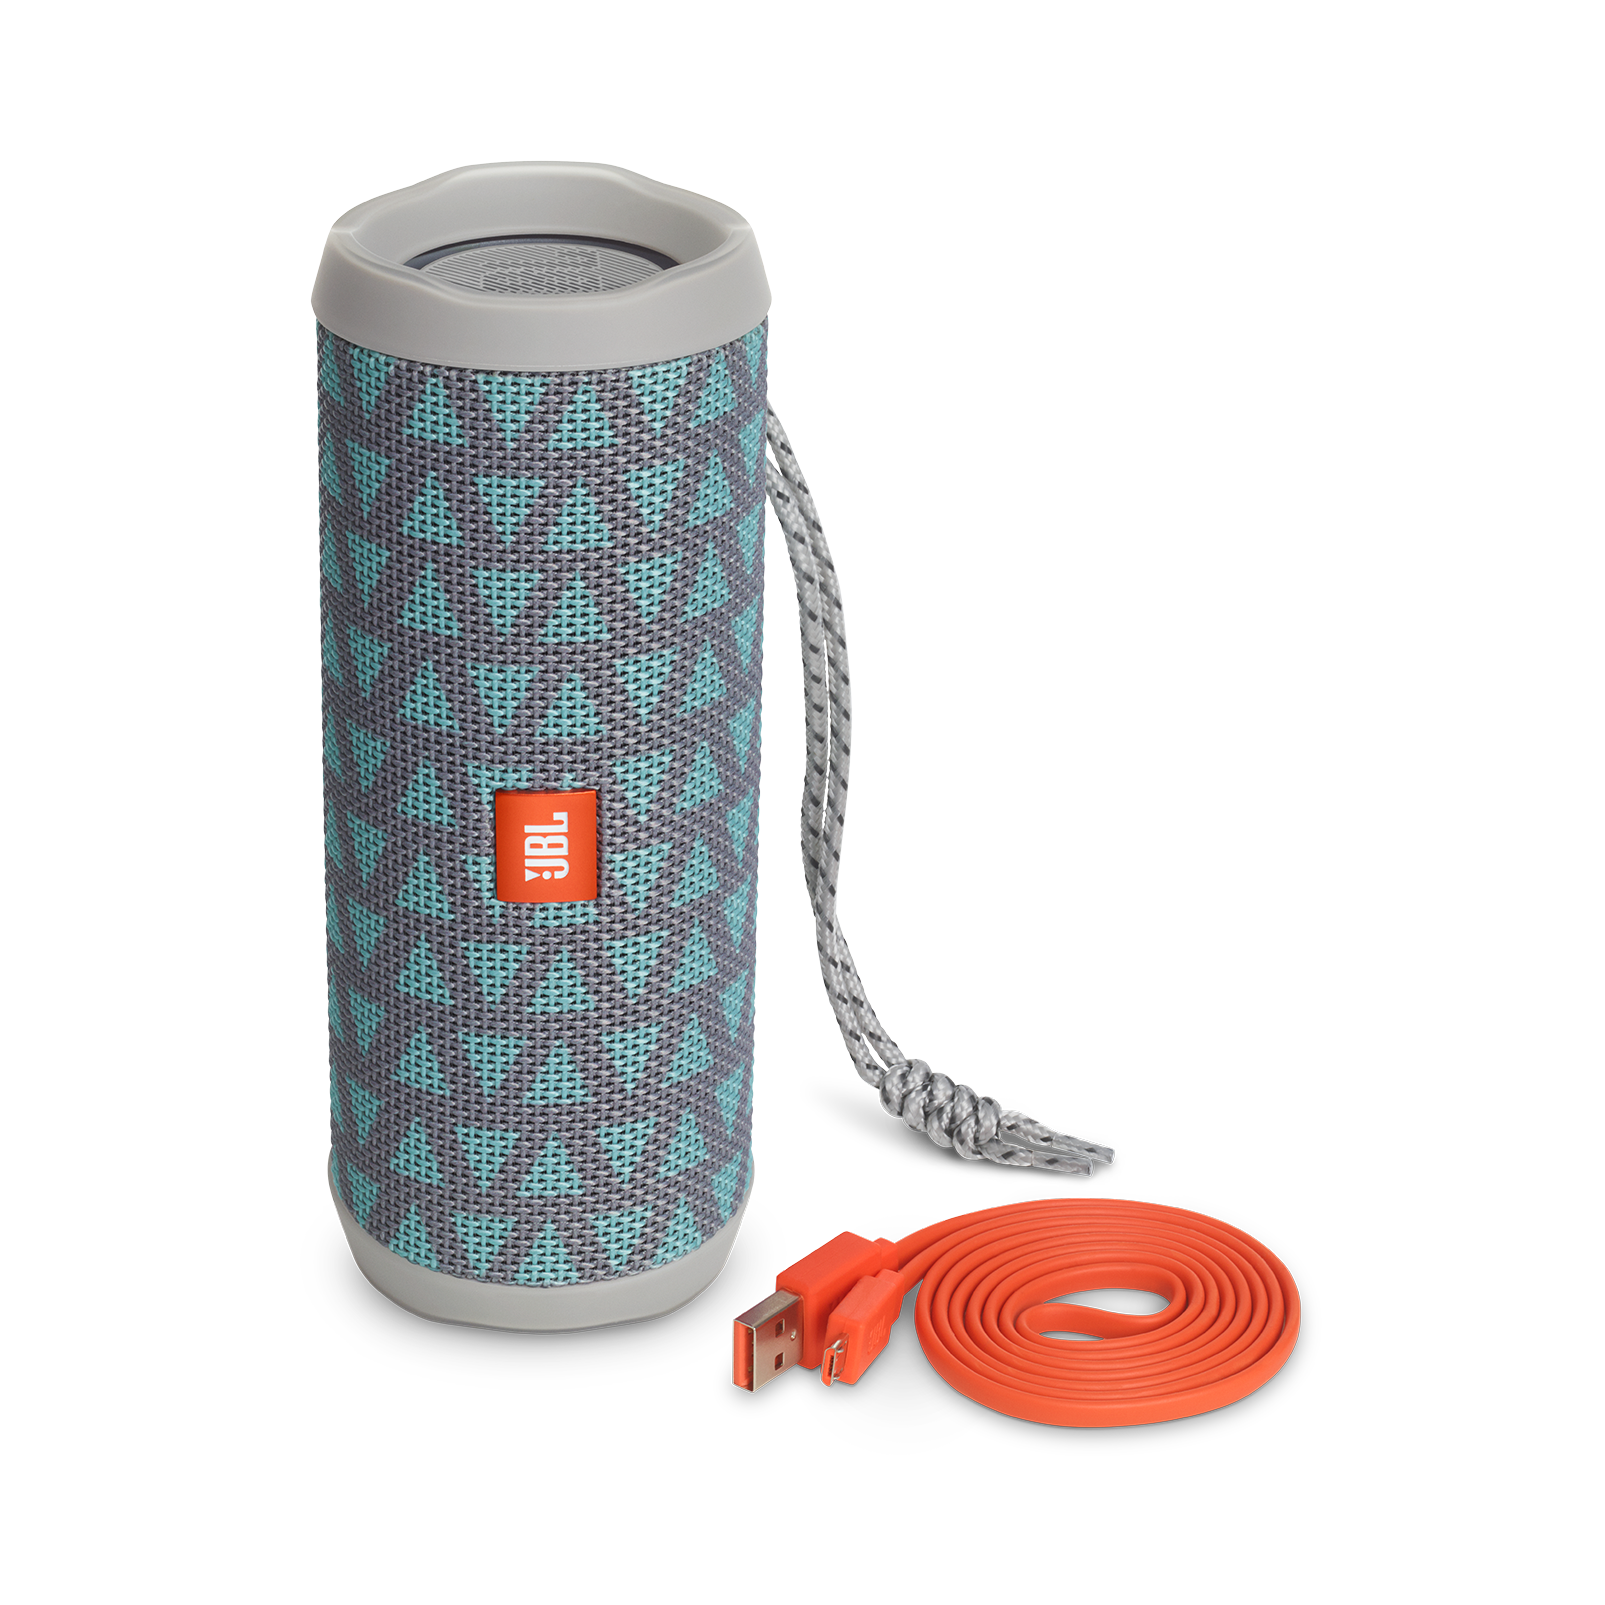 Jbl flip 4 special edition waterproof portable bluetooth for Housse jbl flip 4